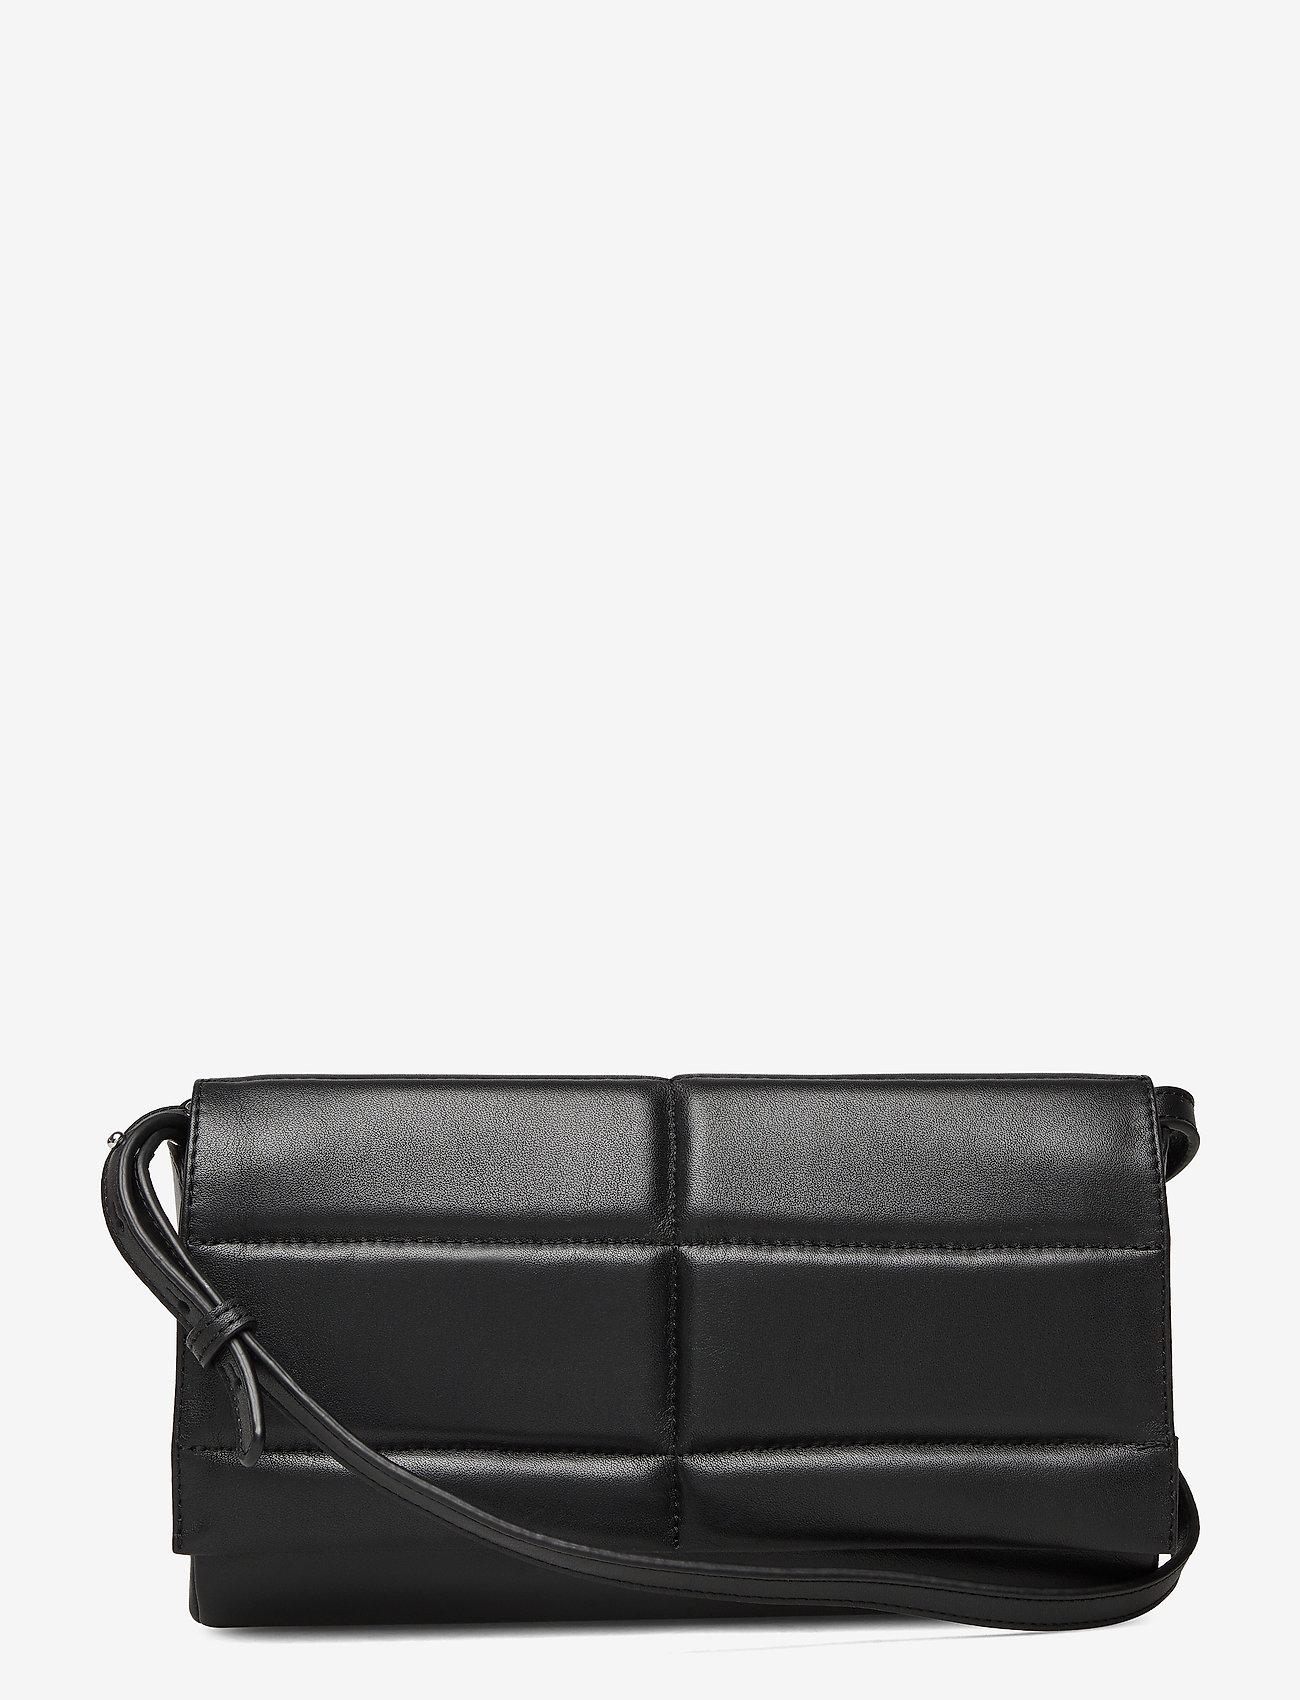 VAGABOND - MALIBU - crossbody bags - black - 0